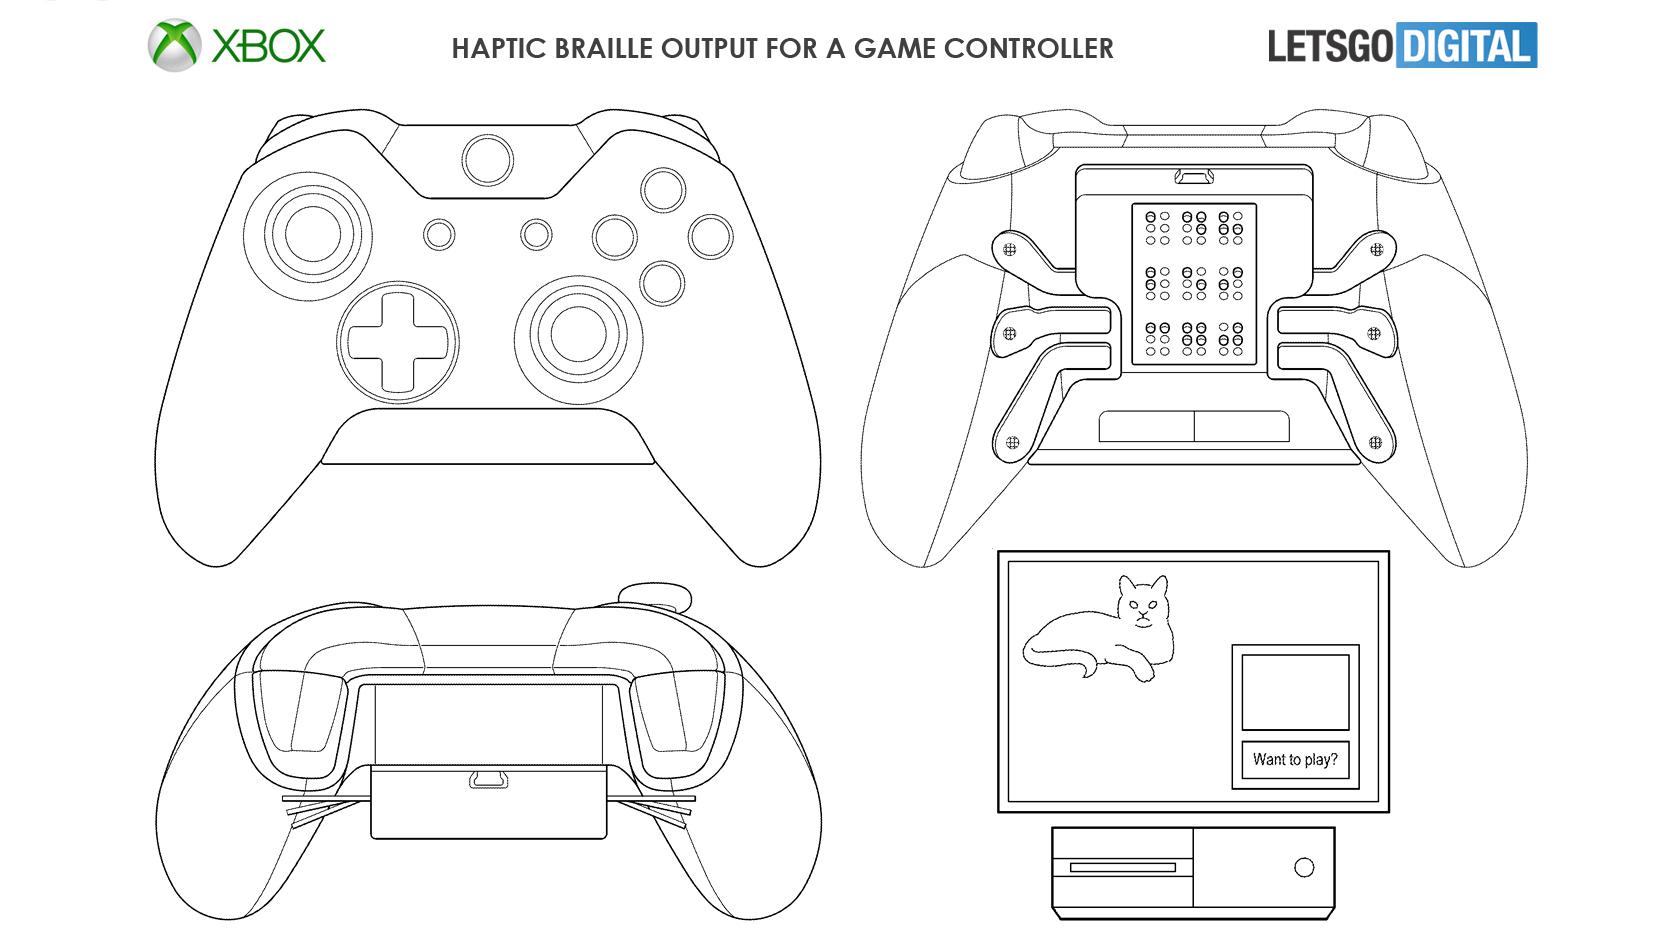 Microsoft Patenta Un Mando De Xbox En Braille Para